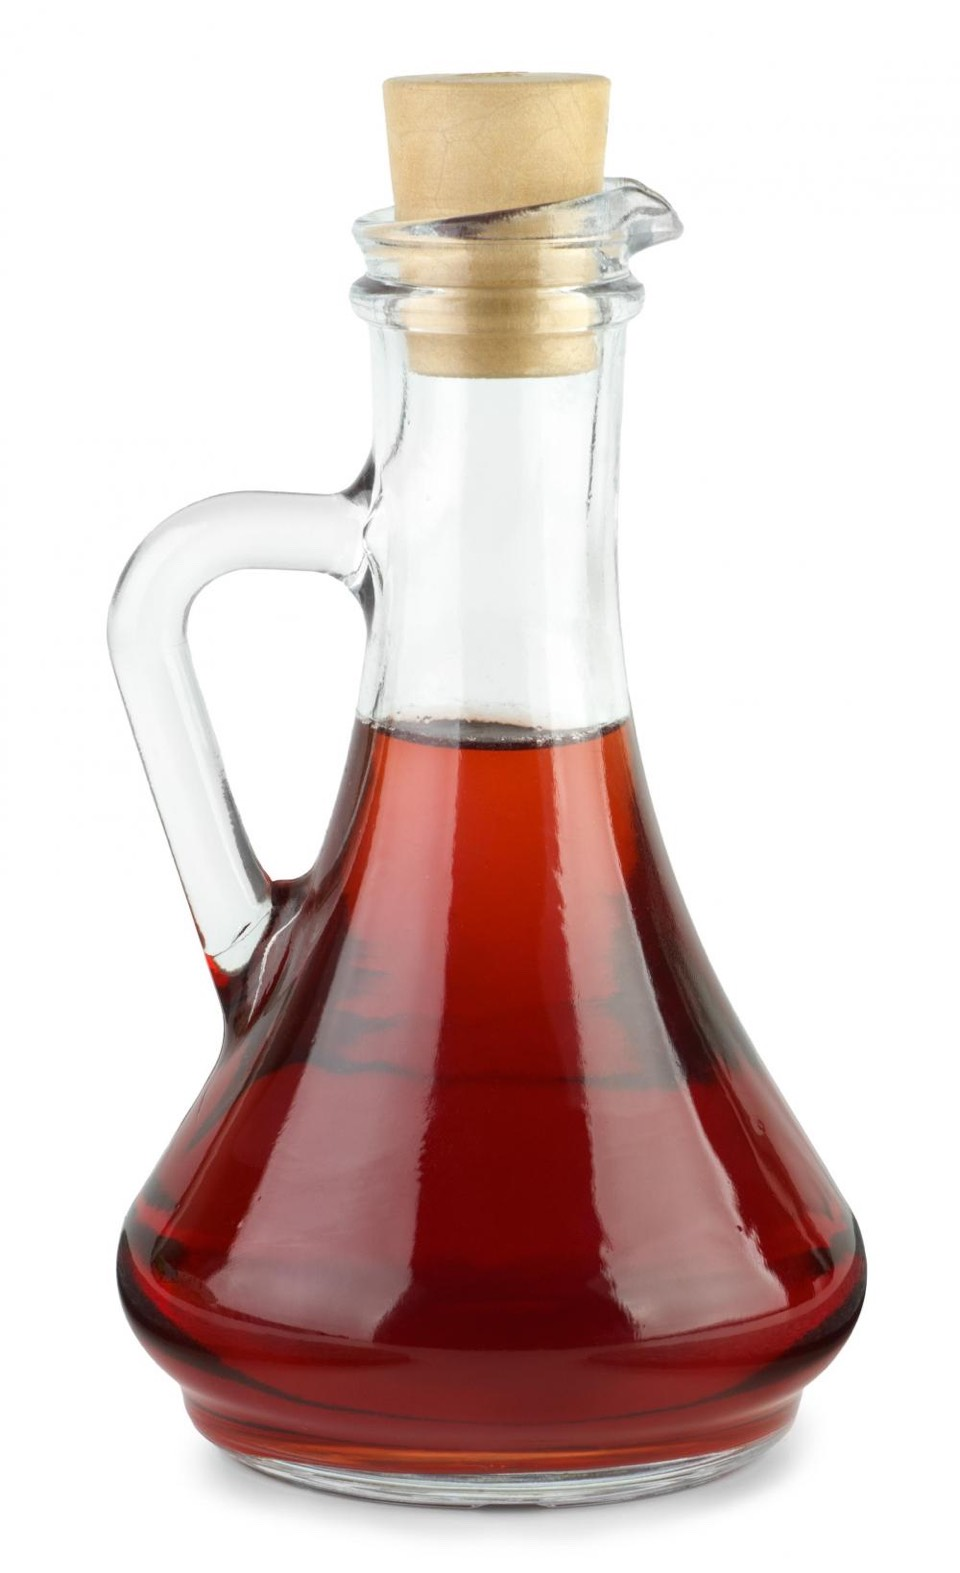 2 tablespoons of vinegar